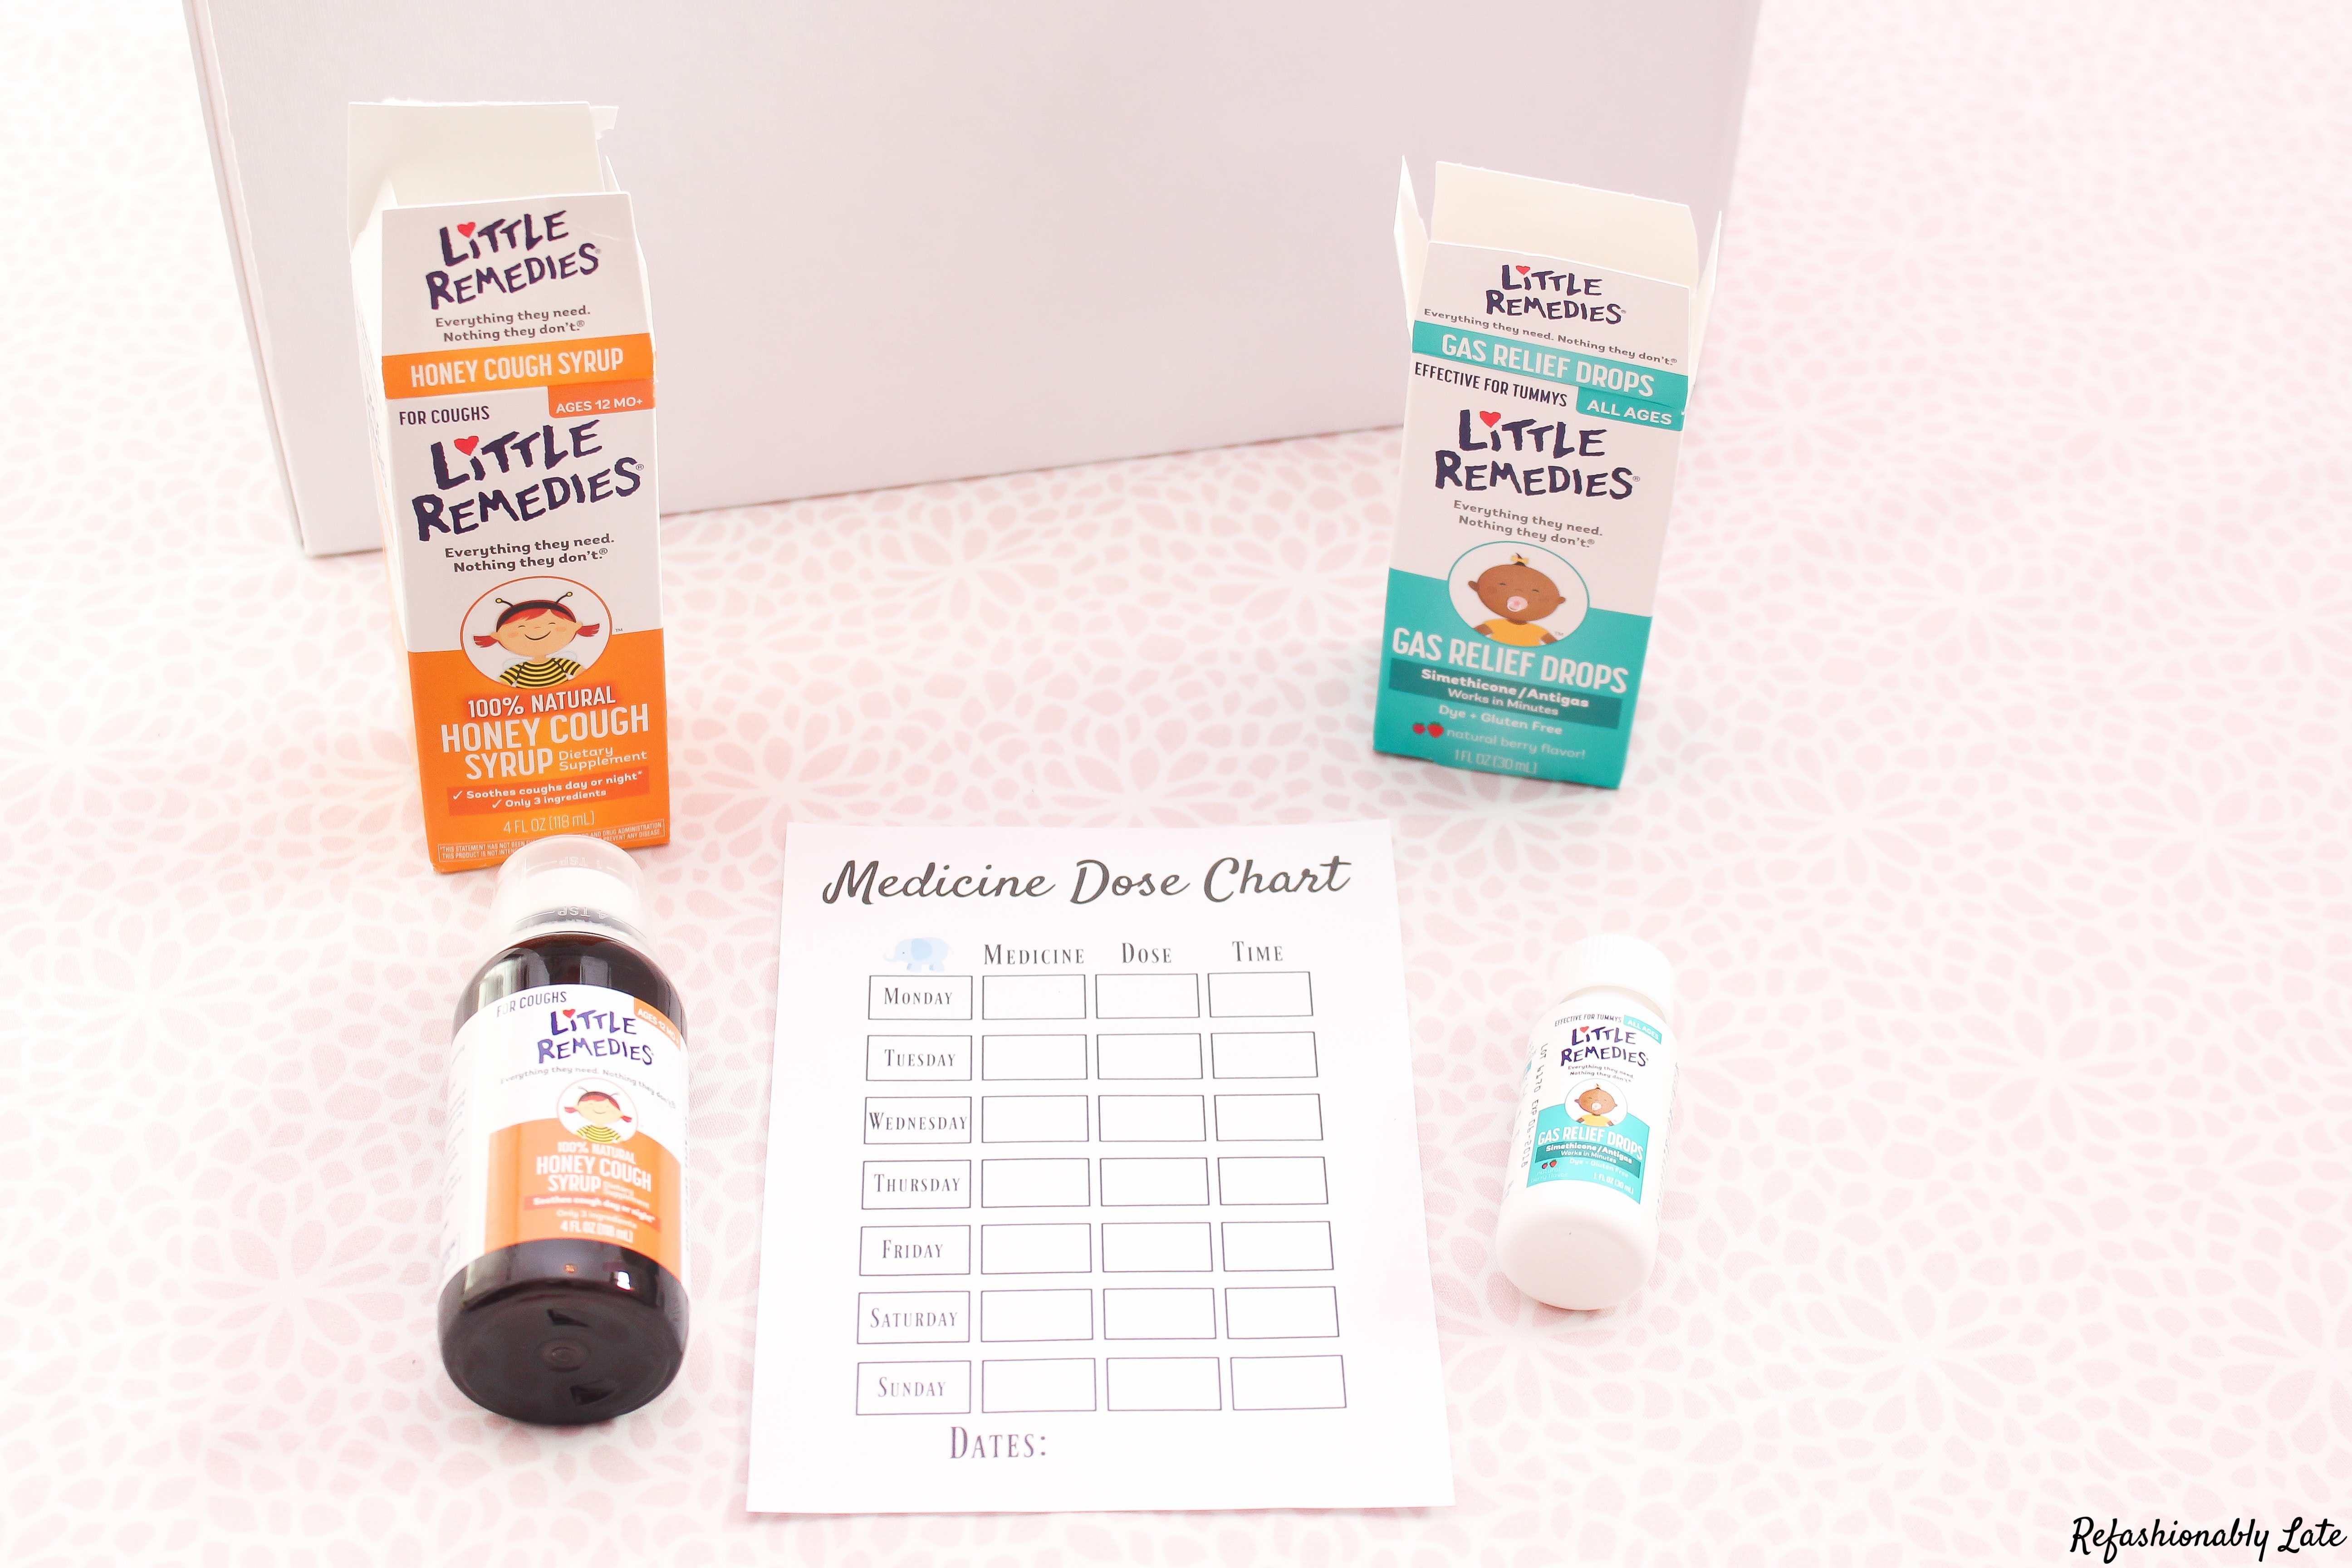 Being Prepared for Baby - www.refashionablylate.com